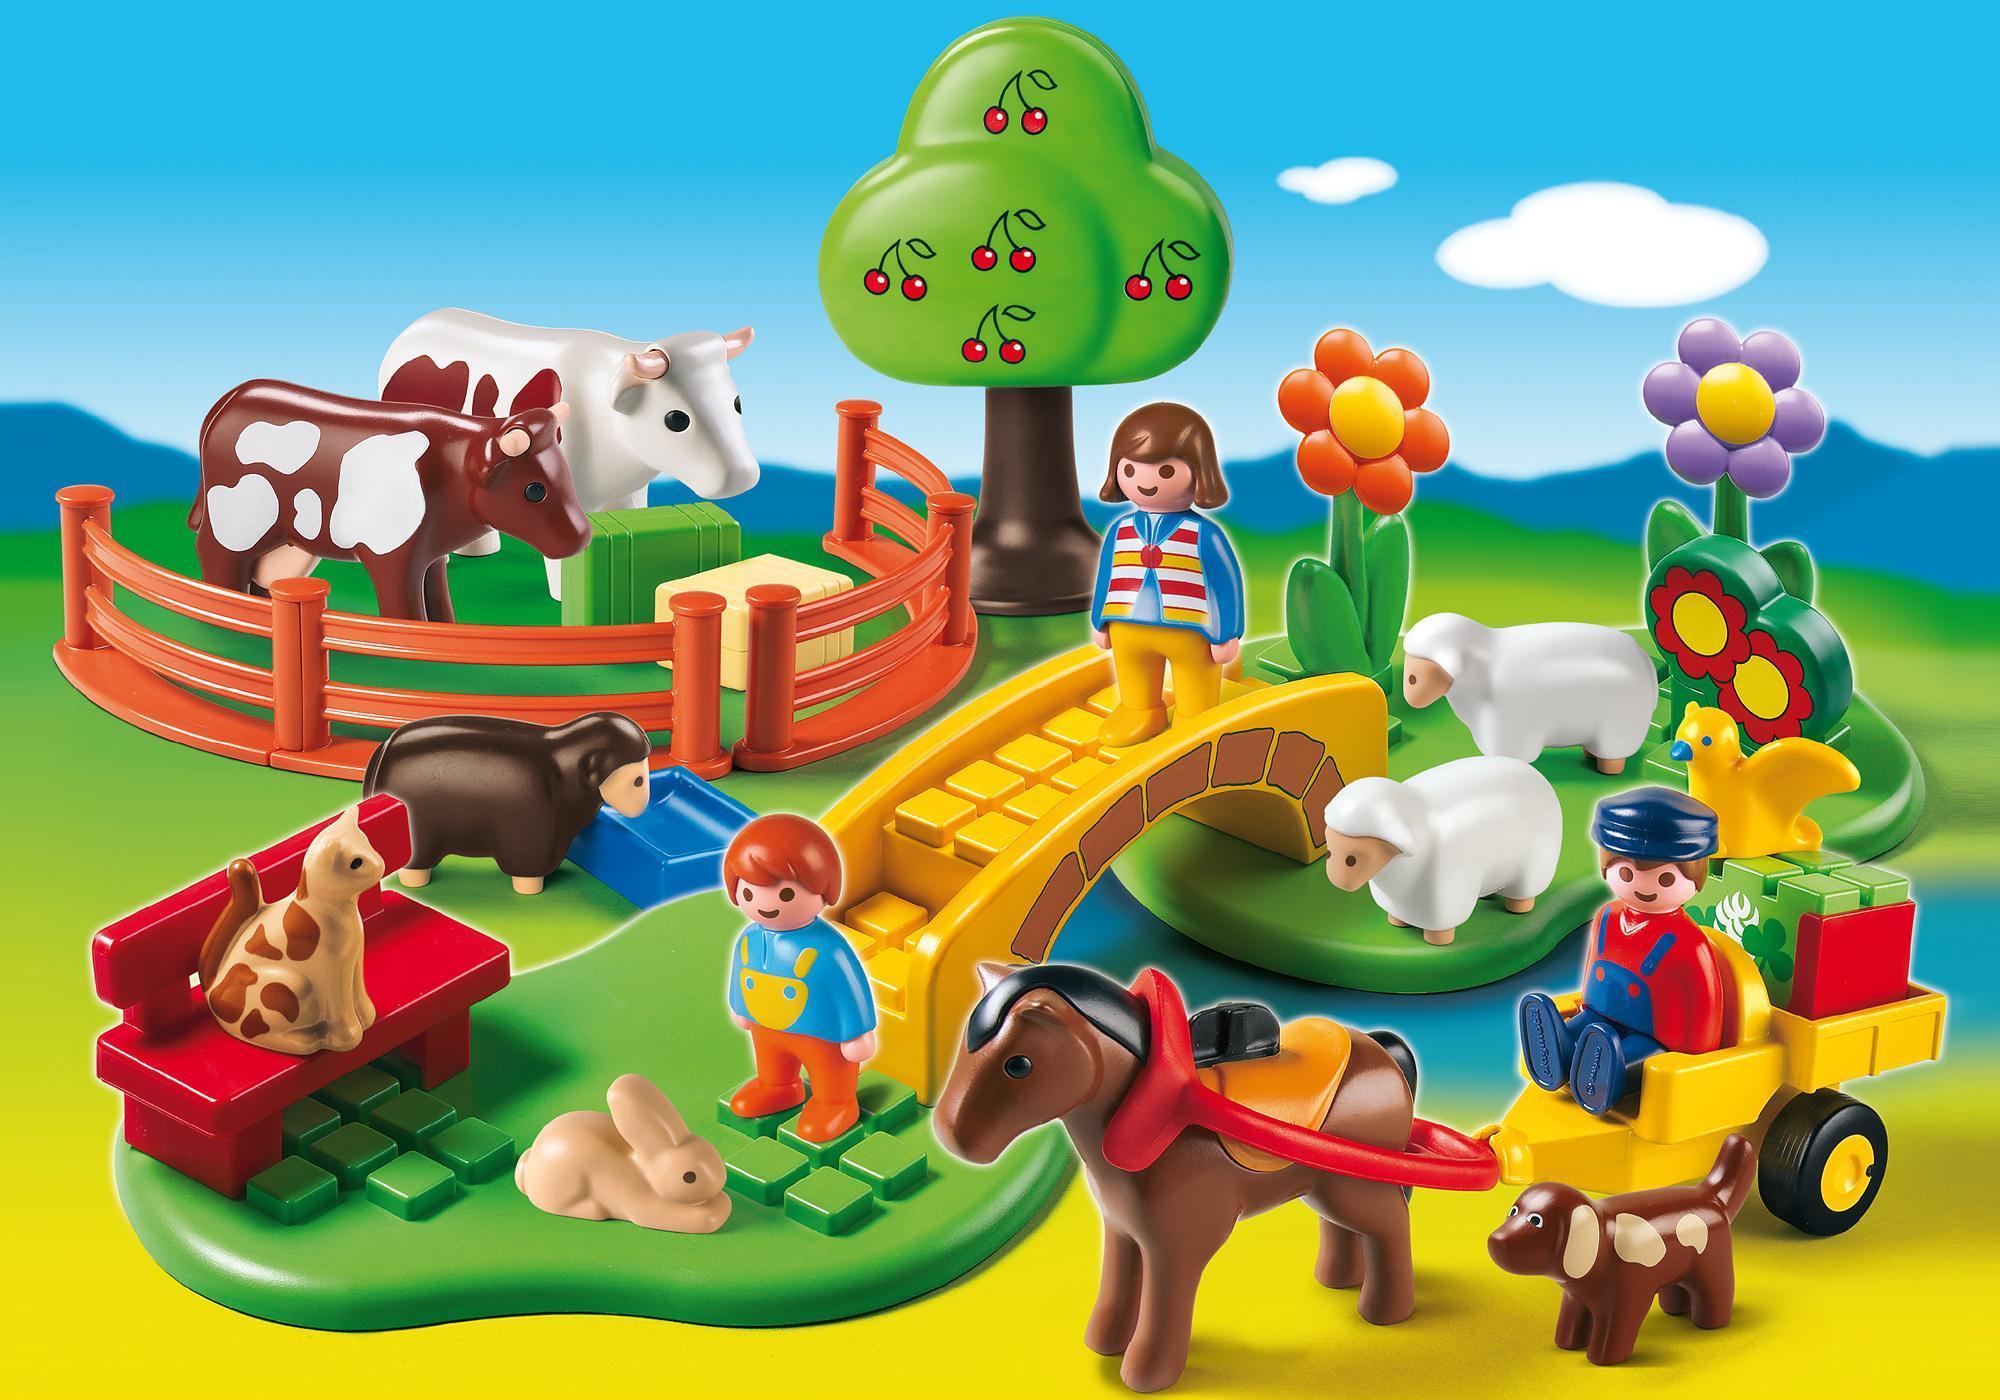 http://media.playmobil.com/i/playmobil/6770_product_detail/1.2.3 Countryside